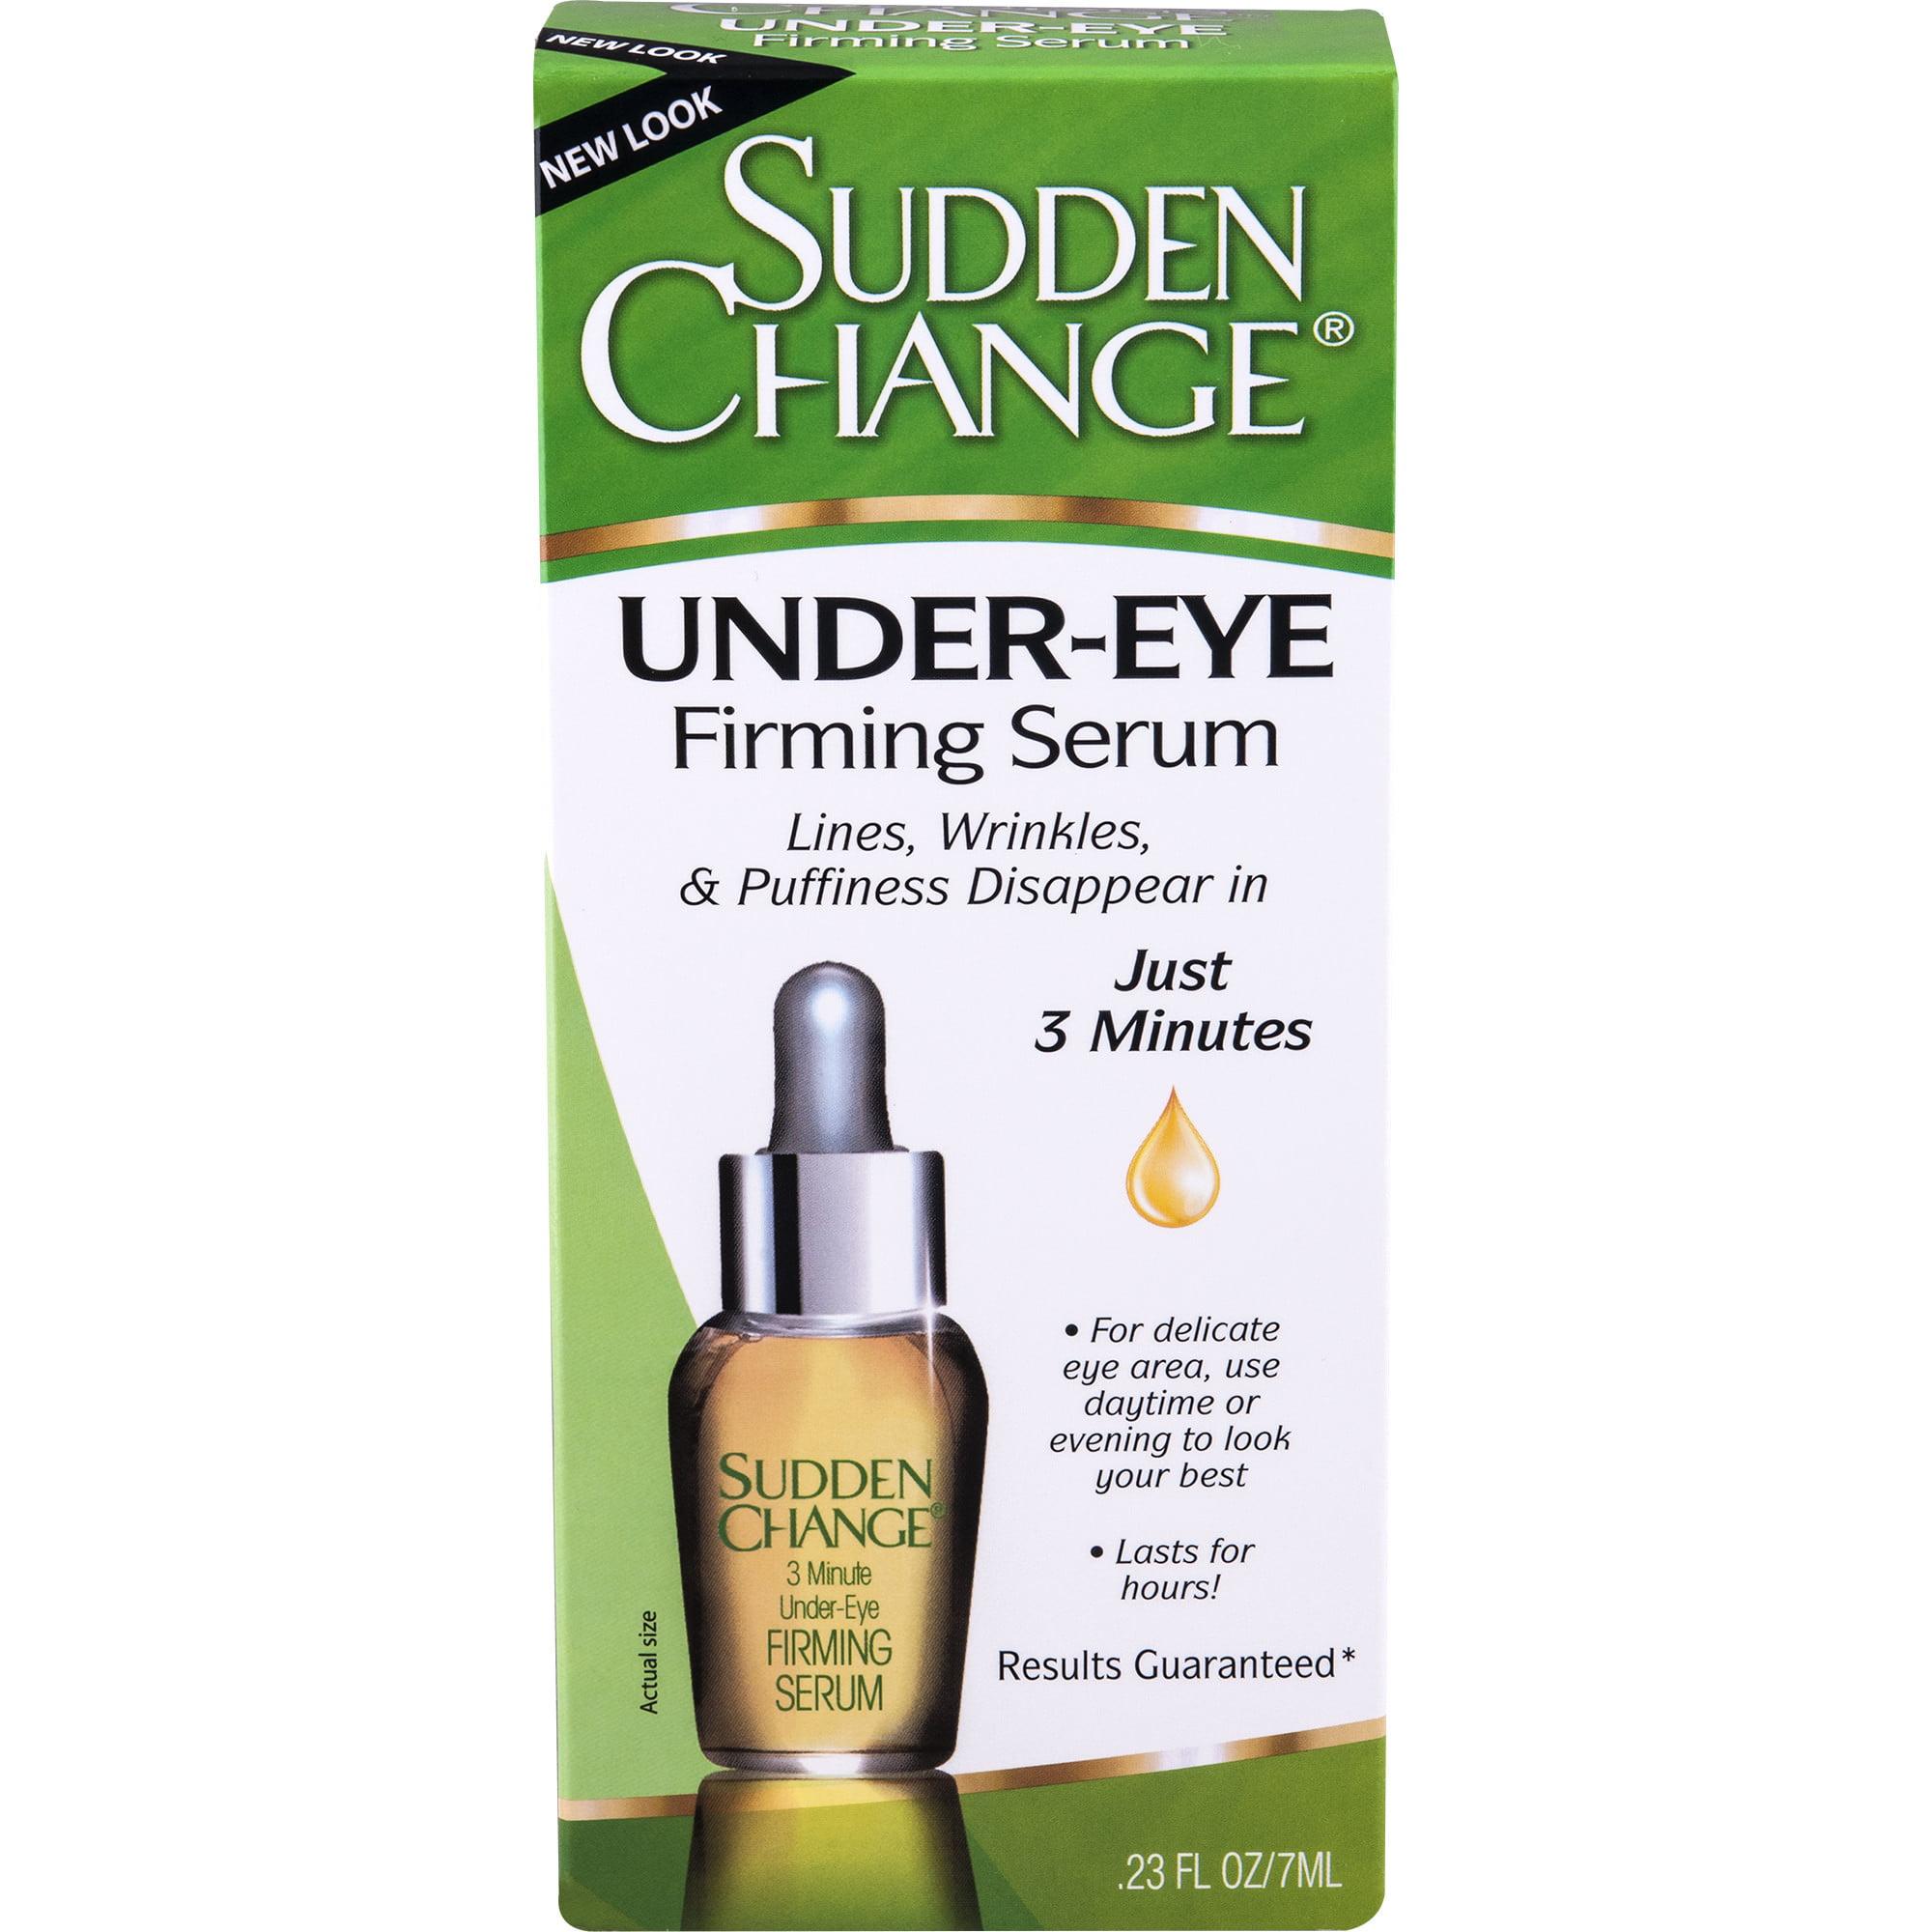 Sudden Change Under Eye Firming Serum Voucer 3second 30 Persen